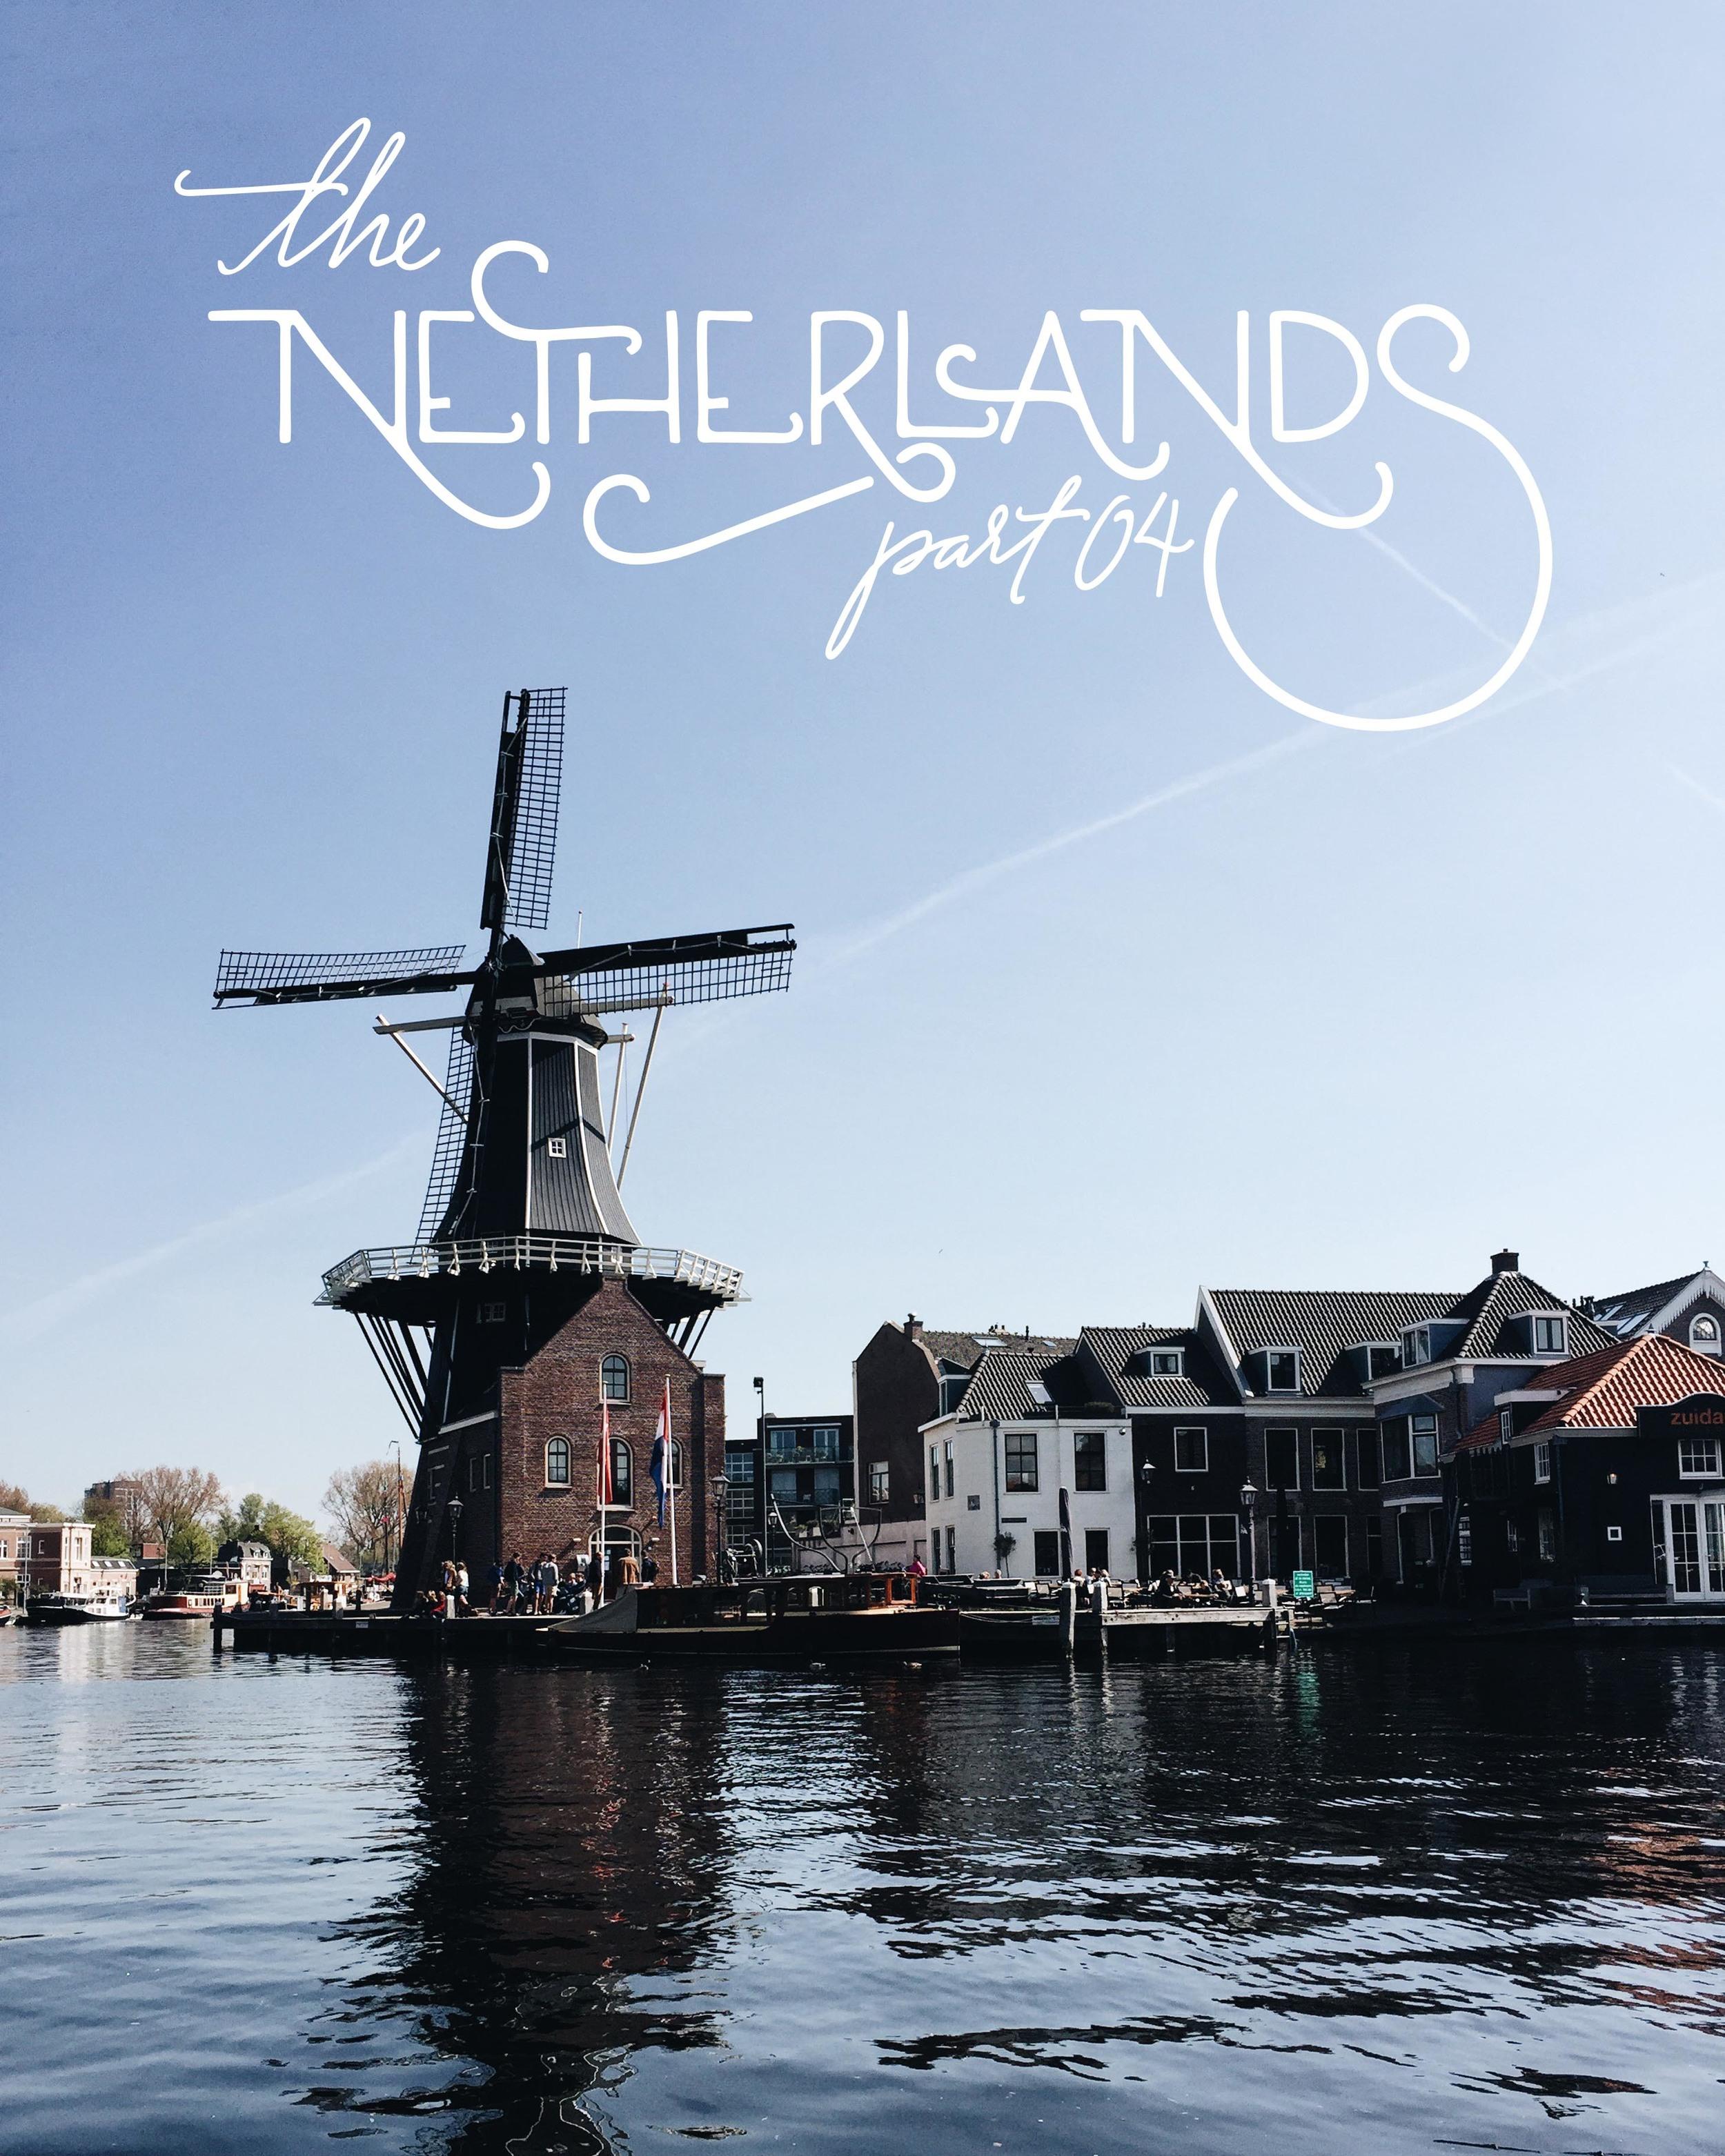 The Netherlands: Dutch Cities   Part 02   Sea of Atlas